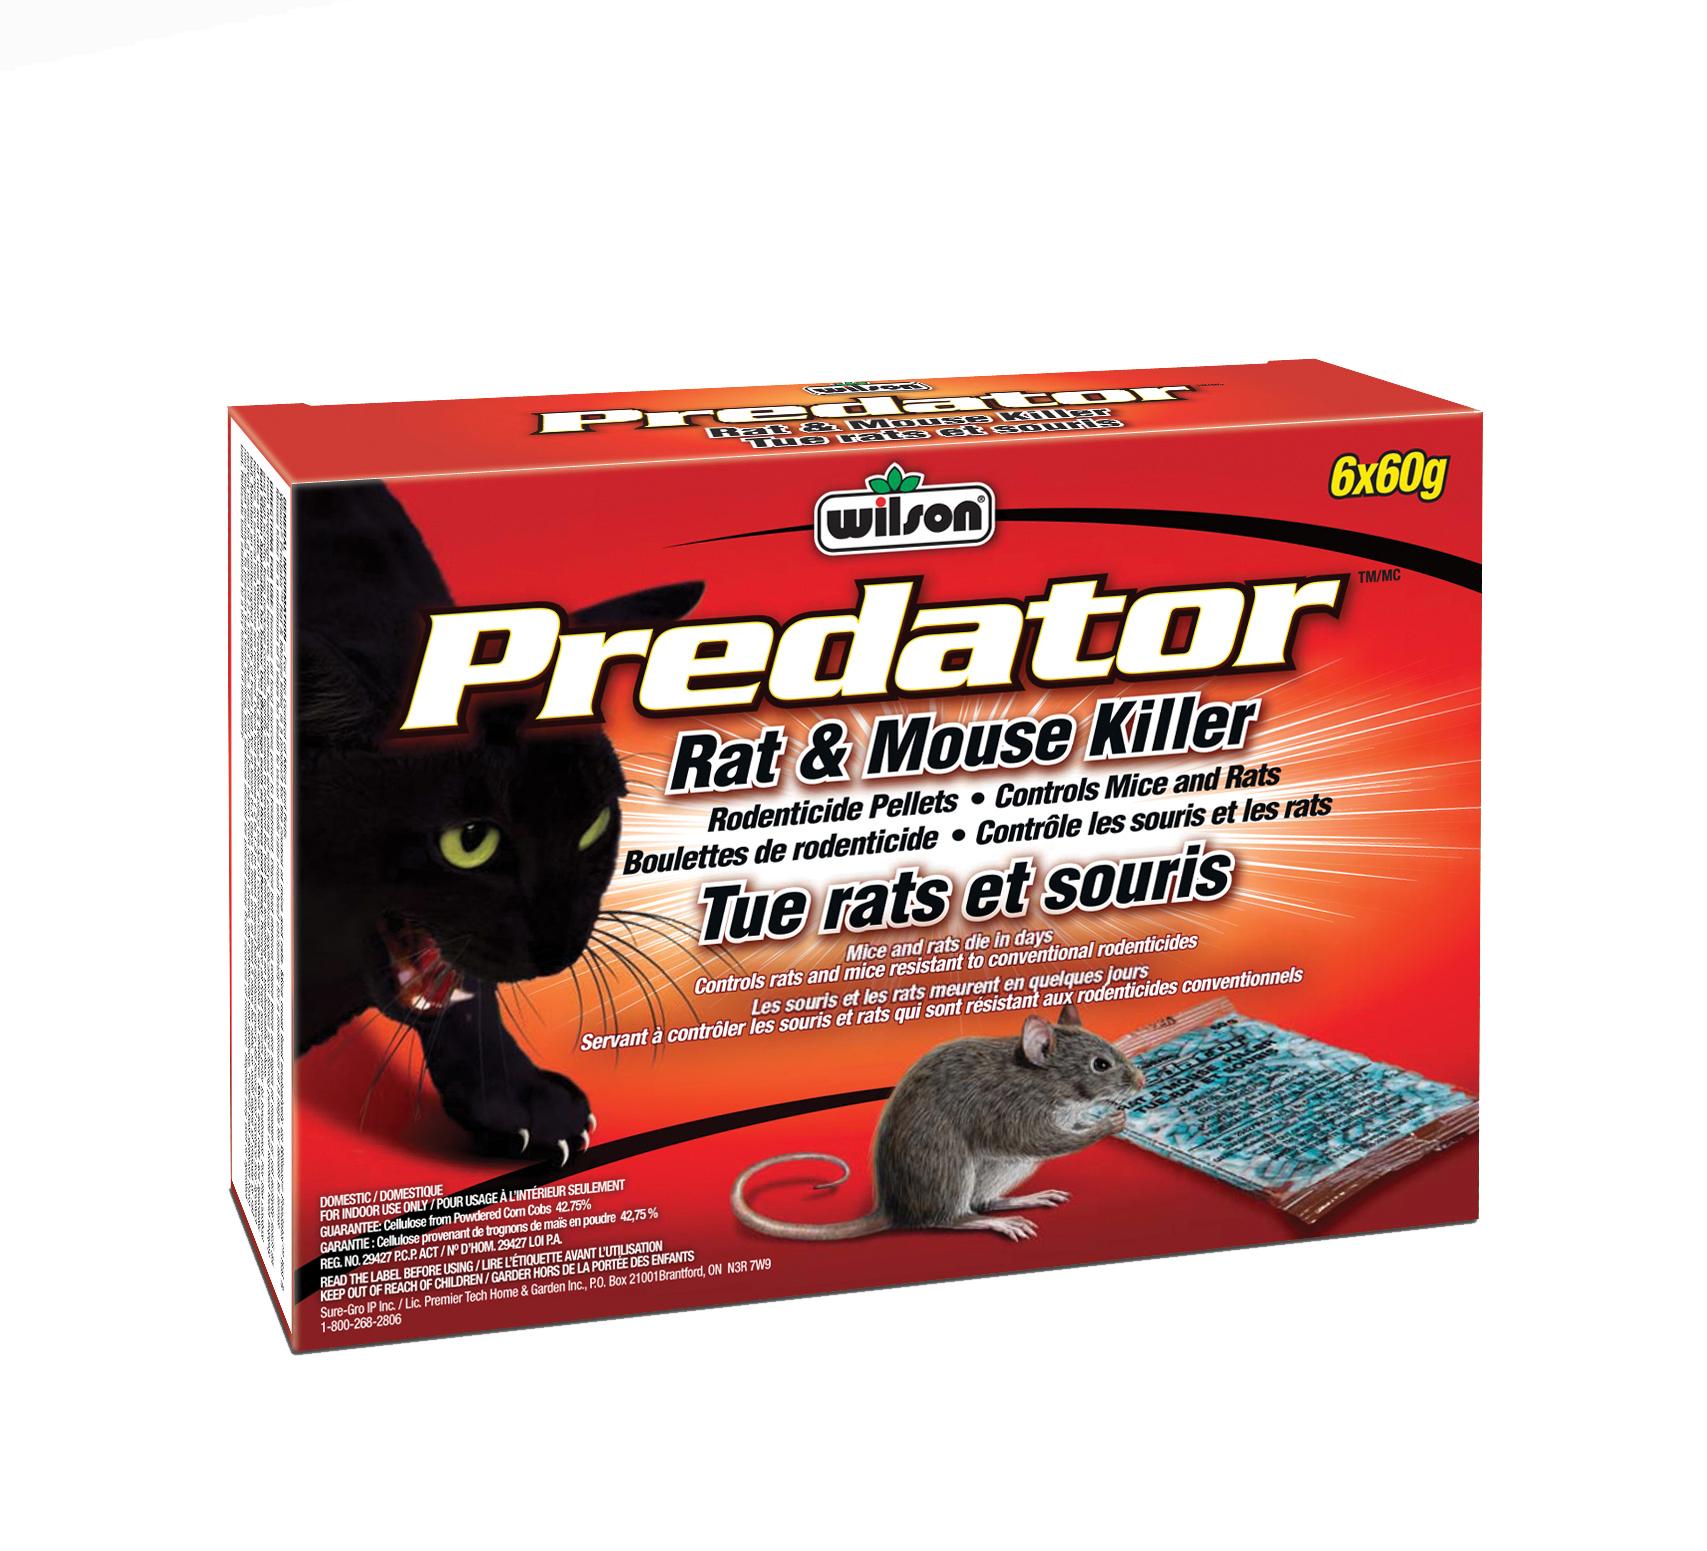 7740110 Wilson Predator Pelletsr 6x60g Hi Res_RGBweb